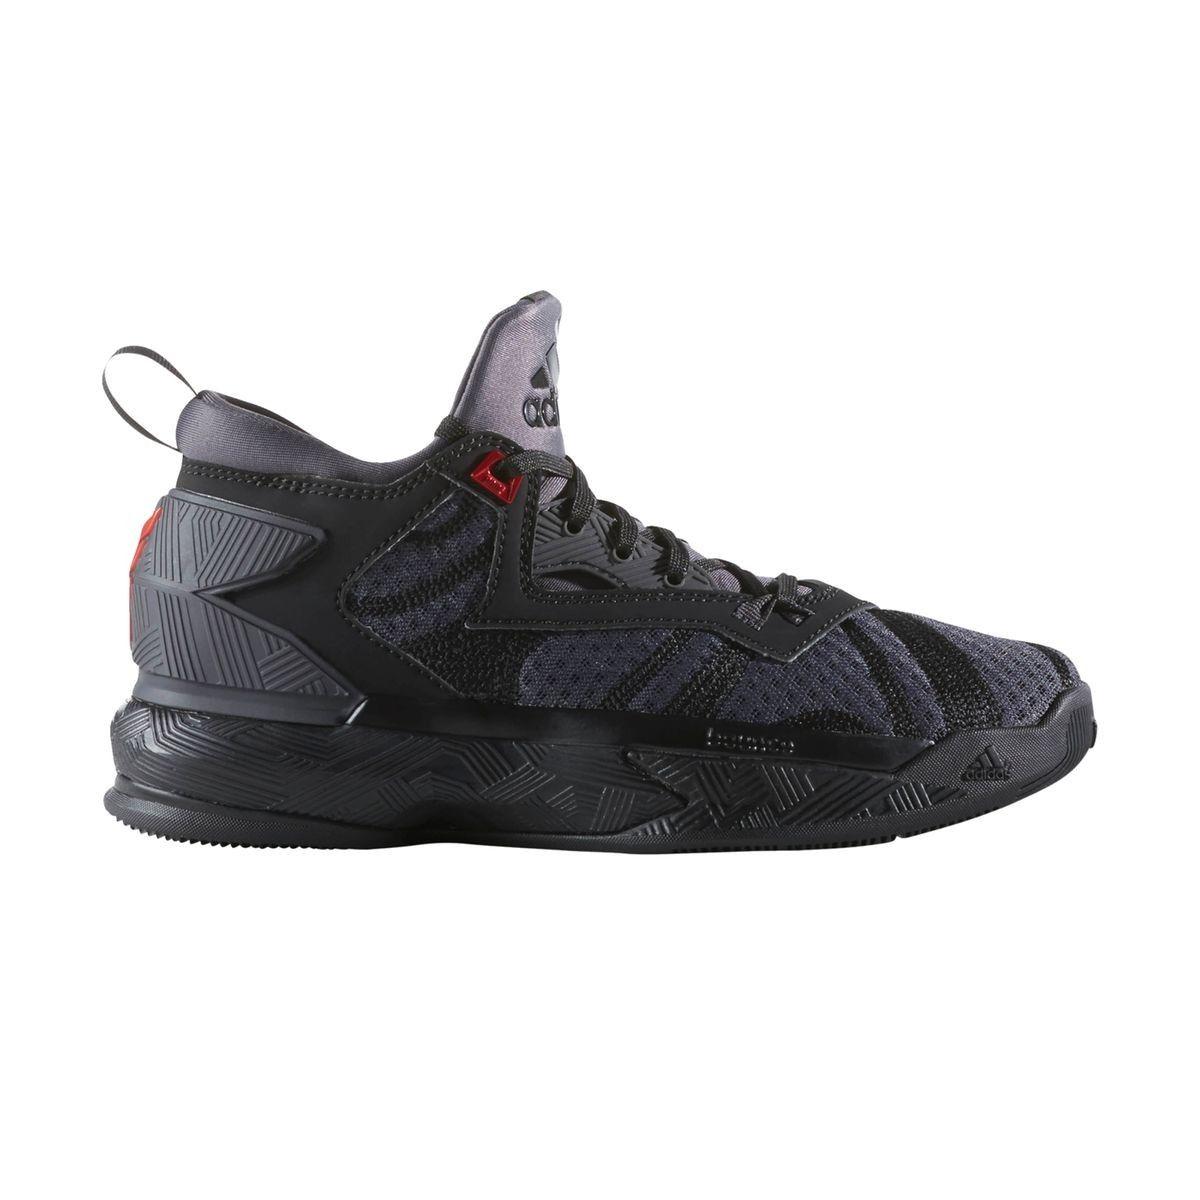 40bd20f89f358 Chaussures Basketball Adidas Damian Lillard Noir Junior - Taille   36